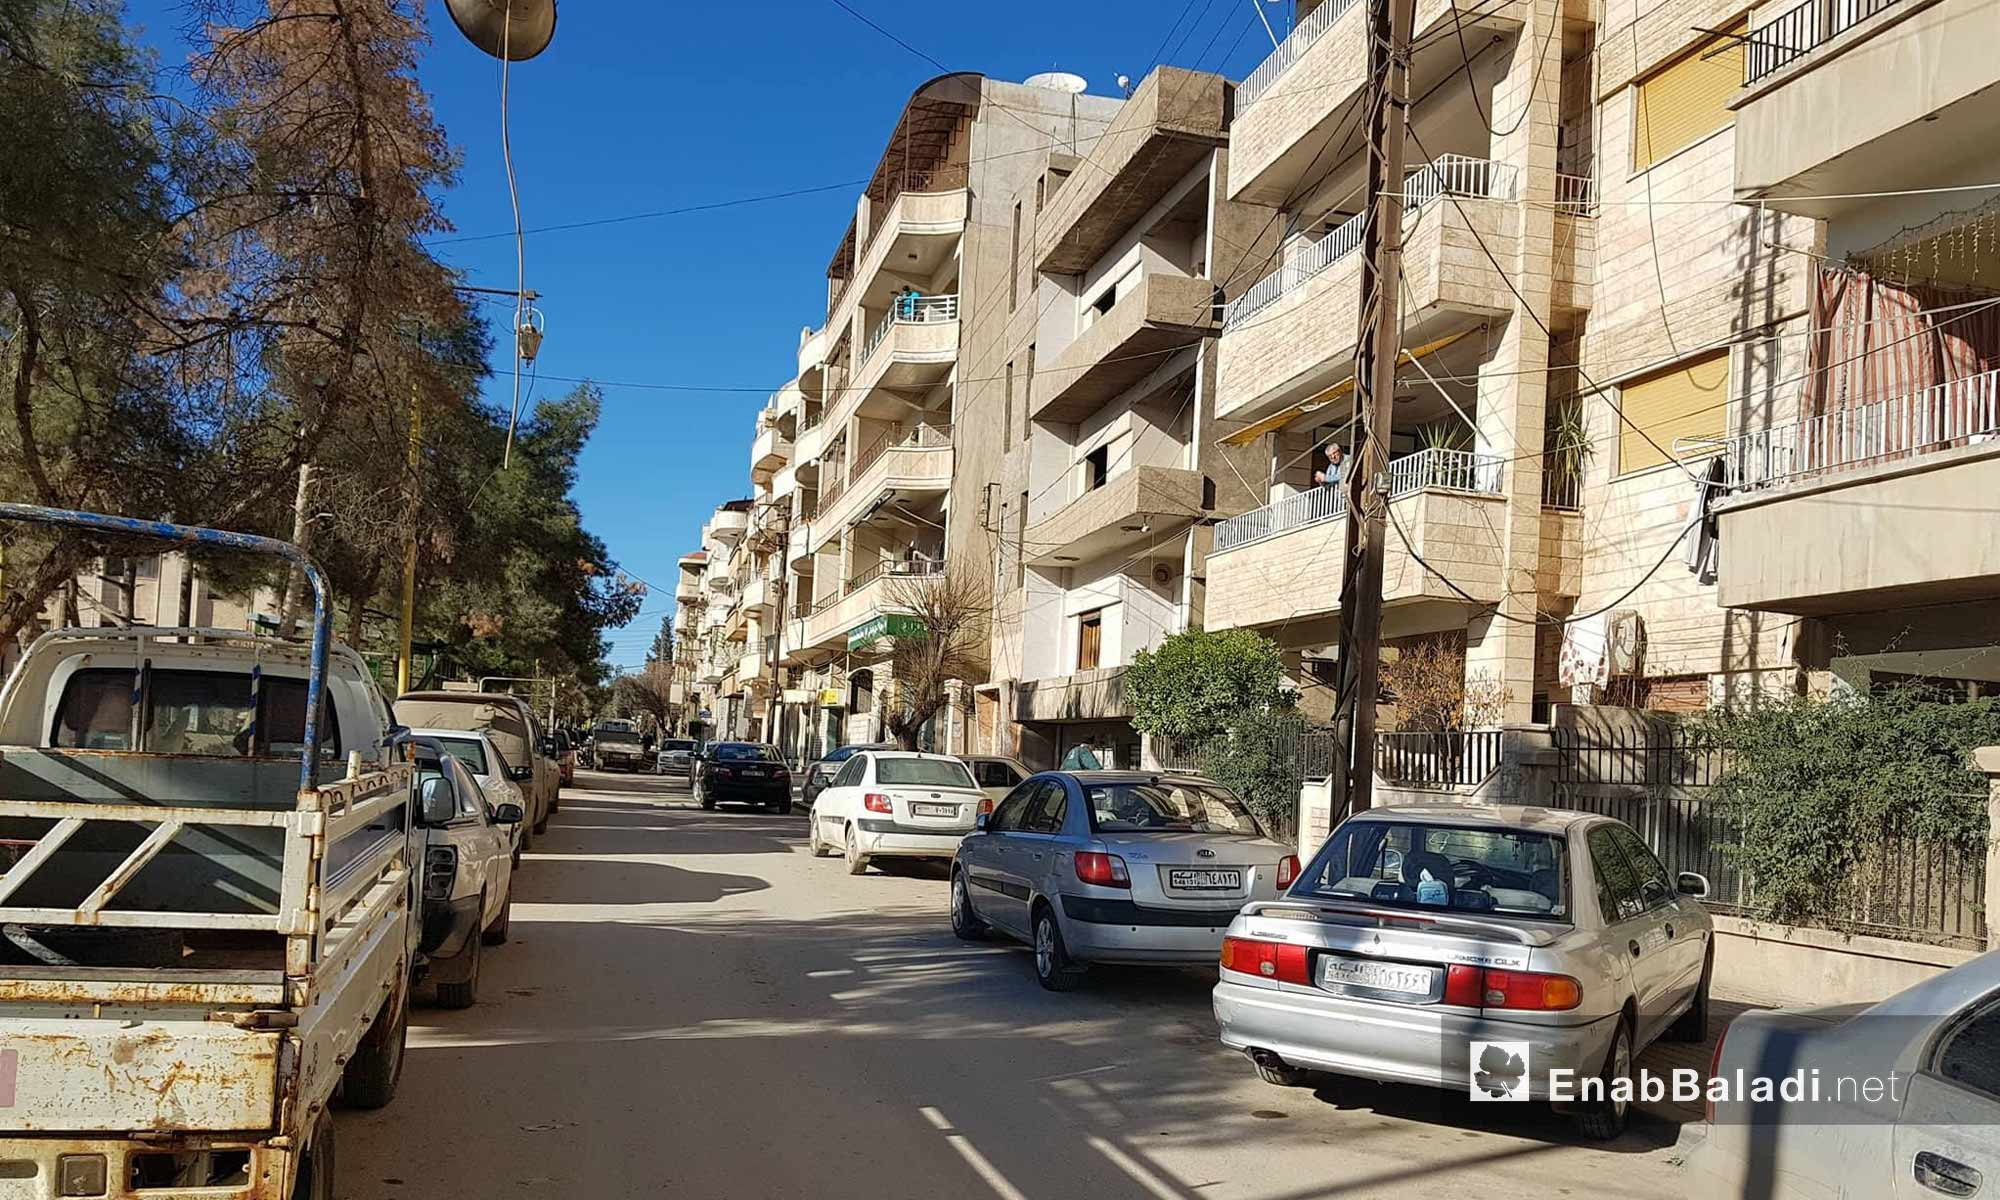 A neighborhood of the al-Qamishli city, the largest region of al-Hasakah province northern Syria - 30 January 2018 (Enab Baladi)